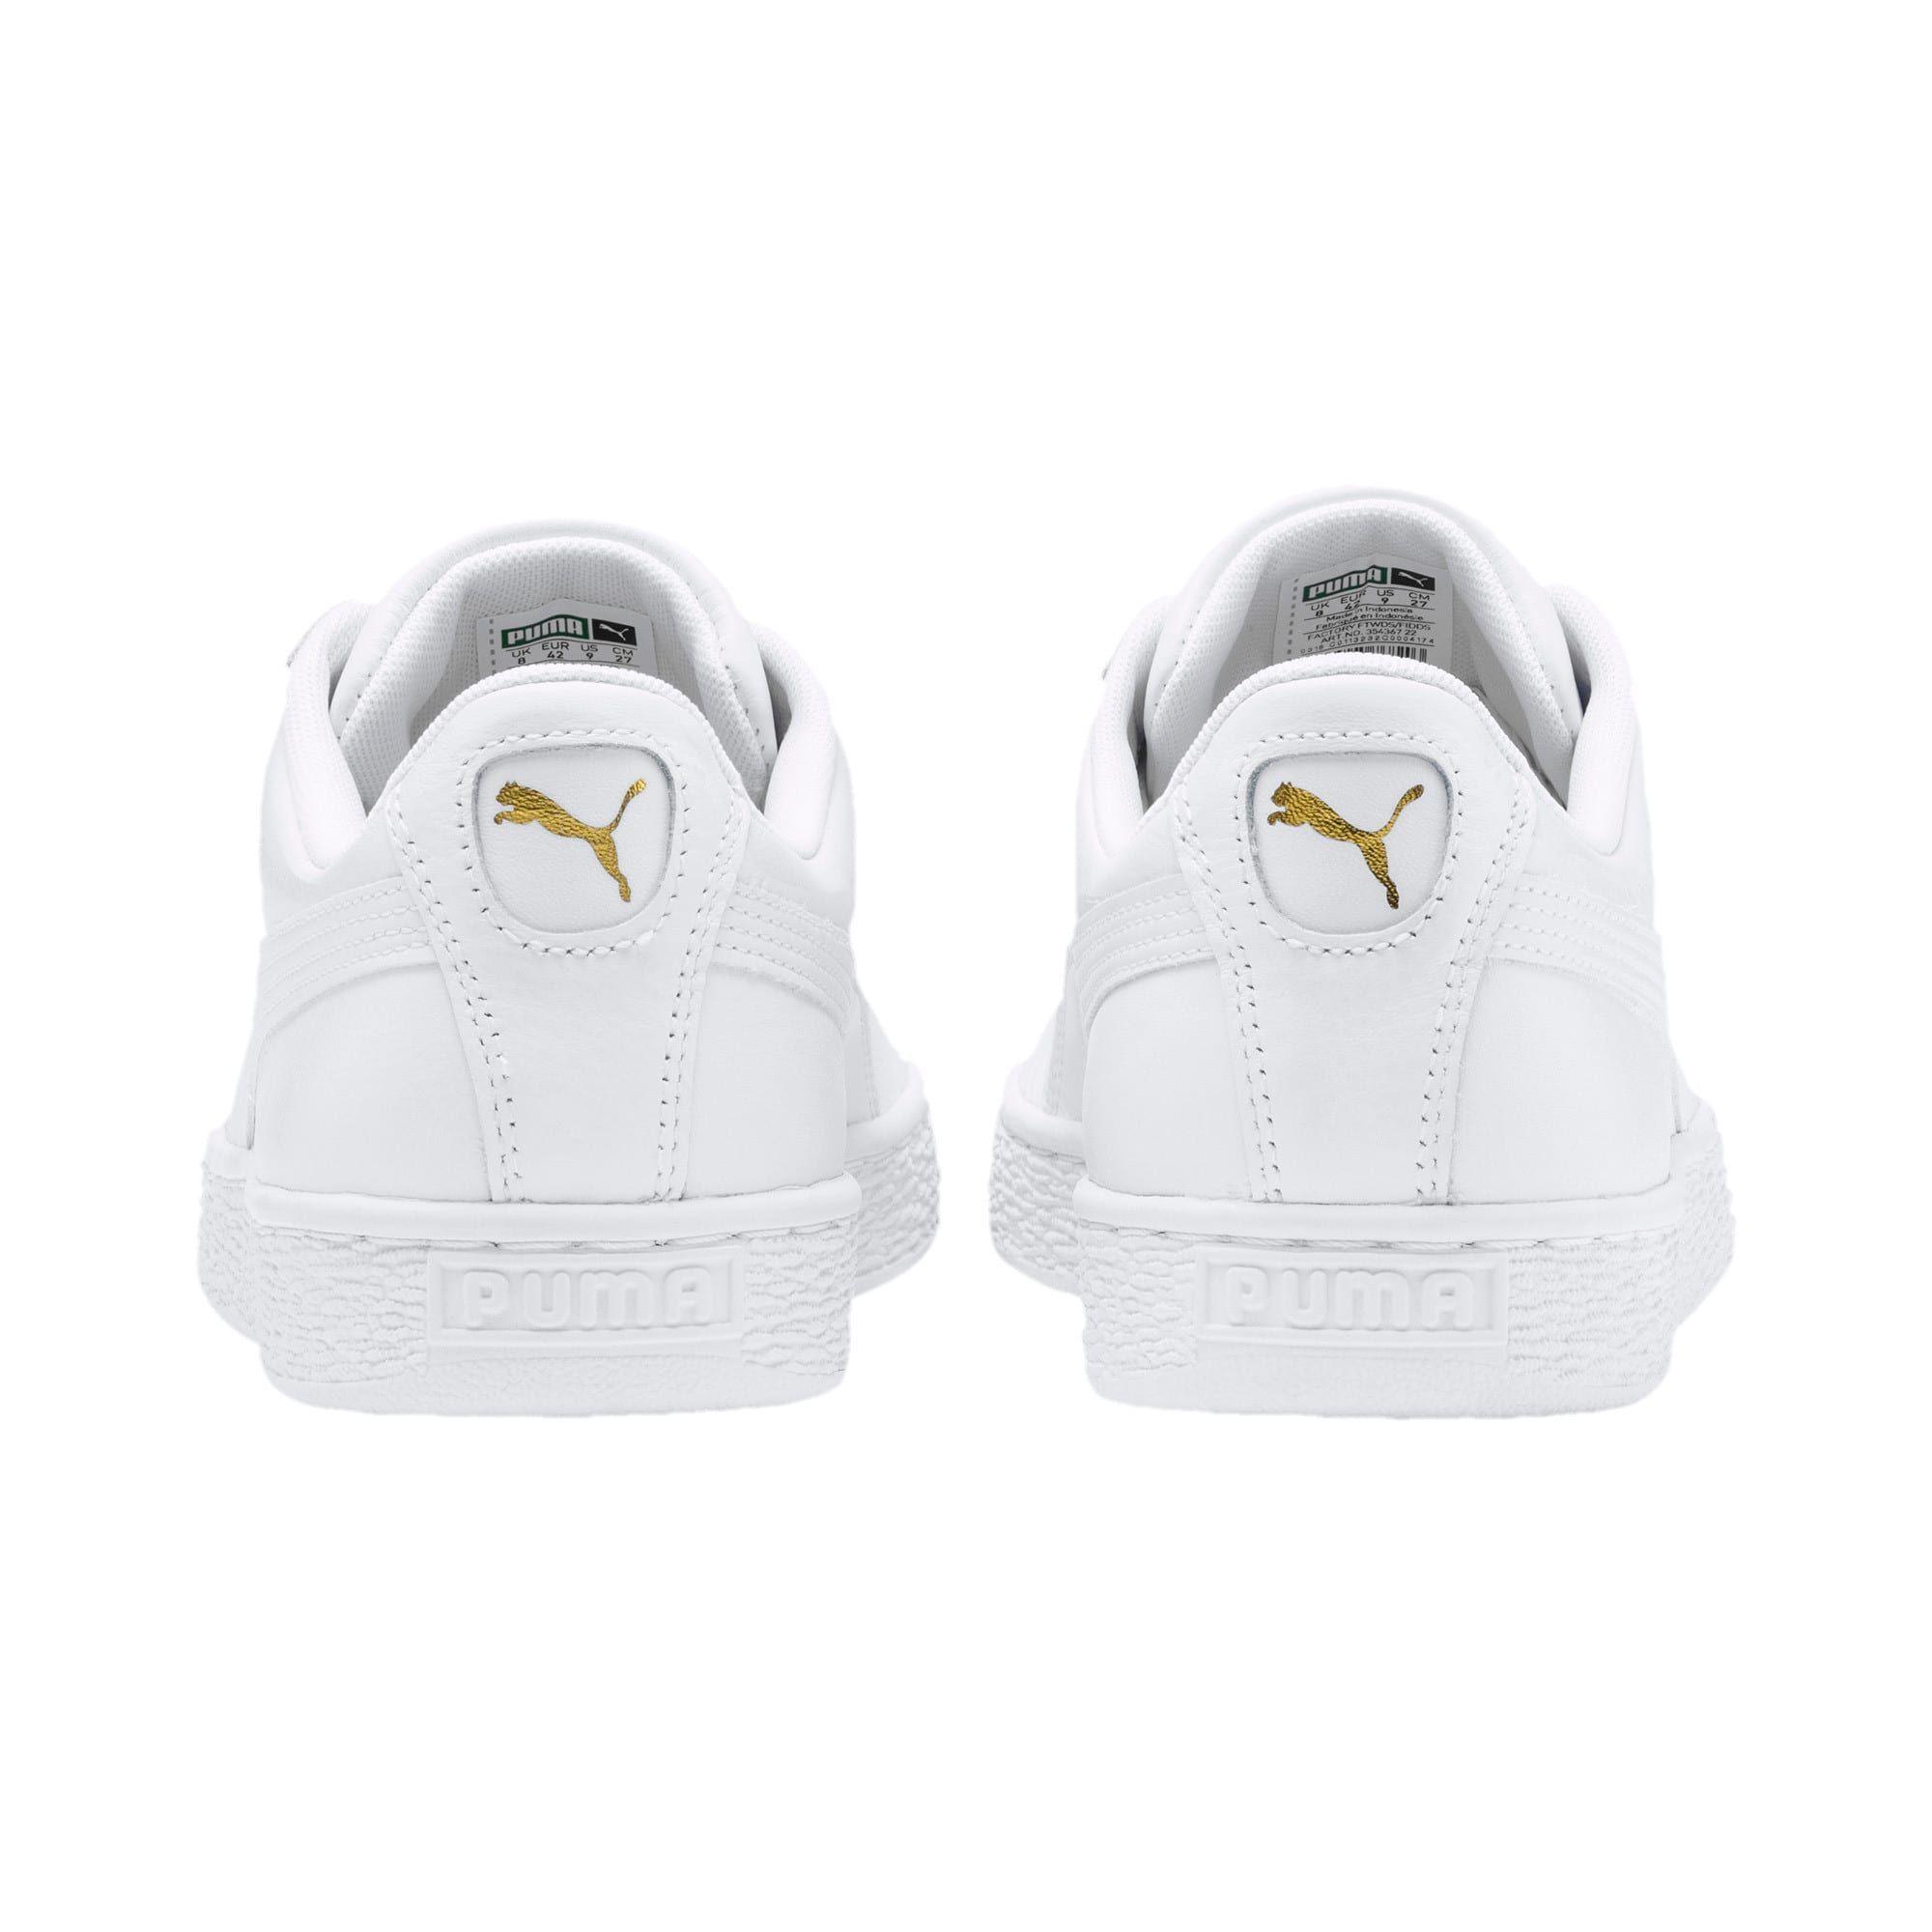 puma basket classic trainers in white